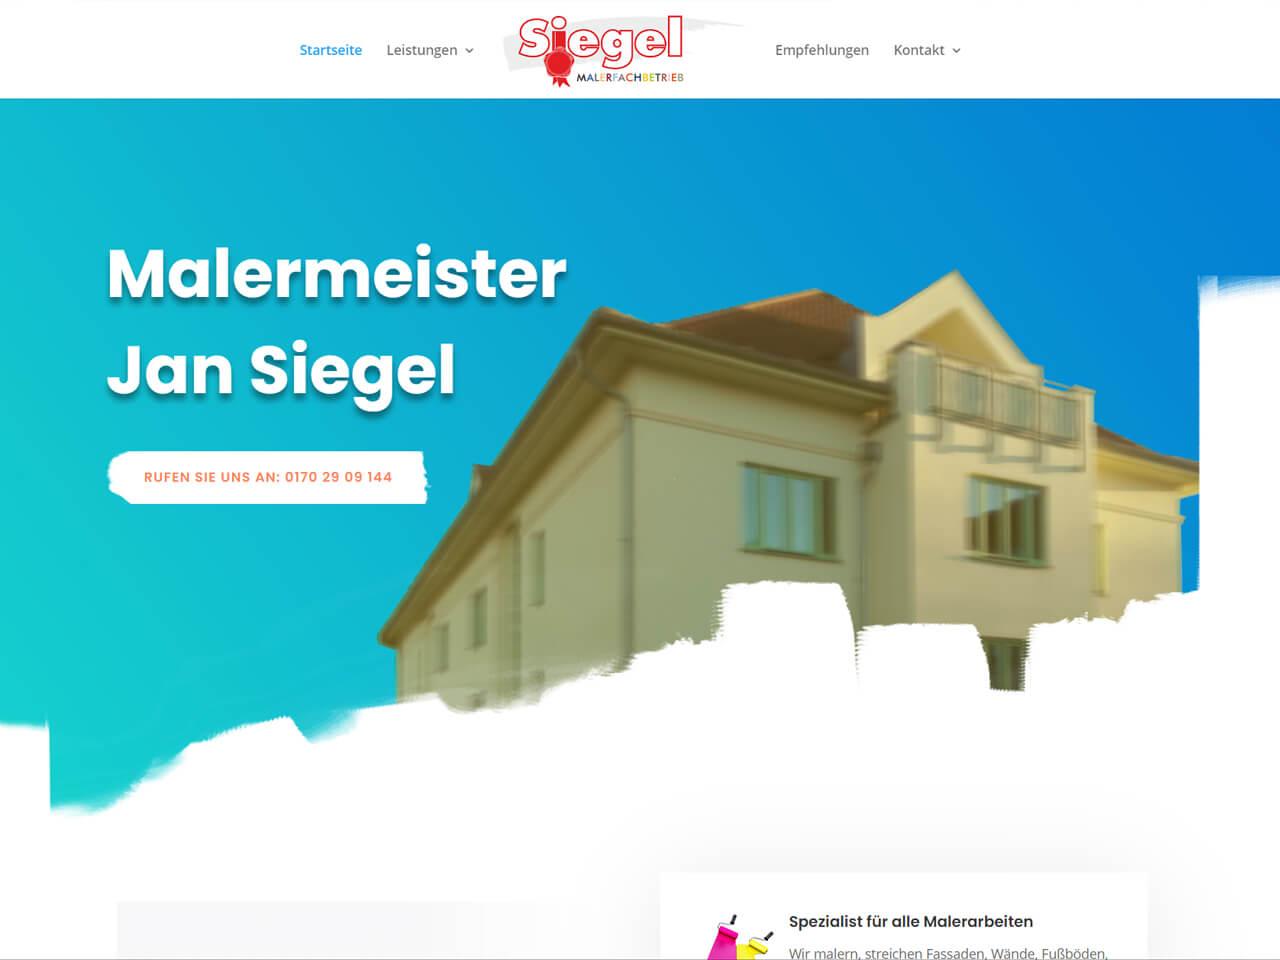 Werbeagentur-Dresden-Wegaswerbung-Webdesign-Webseite-Malermeister-Siegel